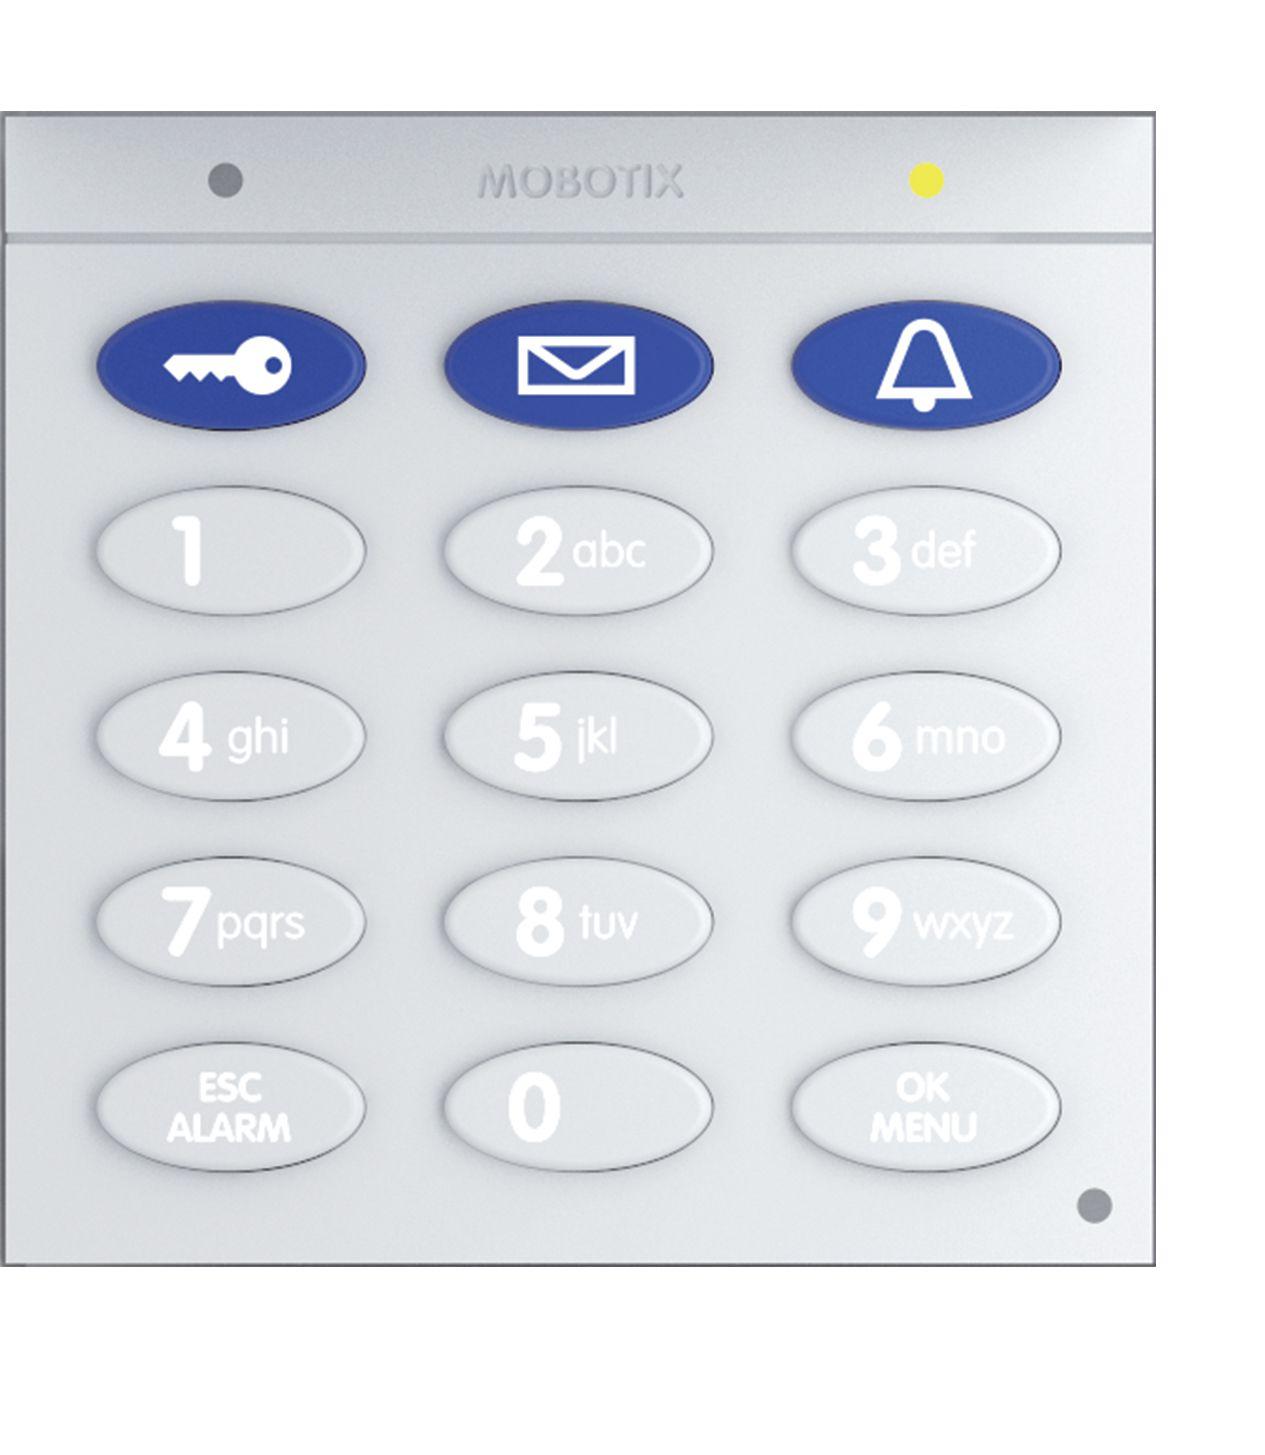 Mobotix T25 intercom - RFID module